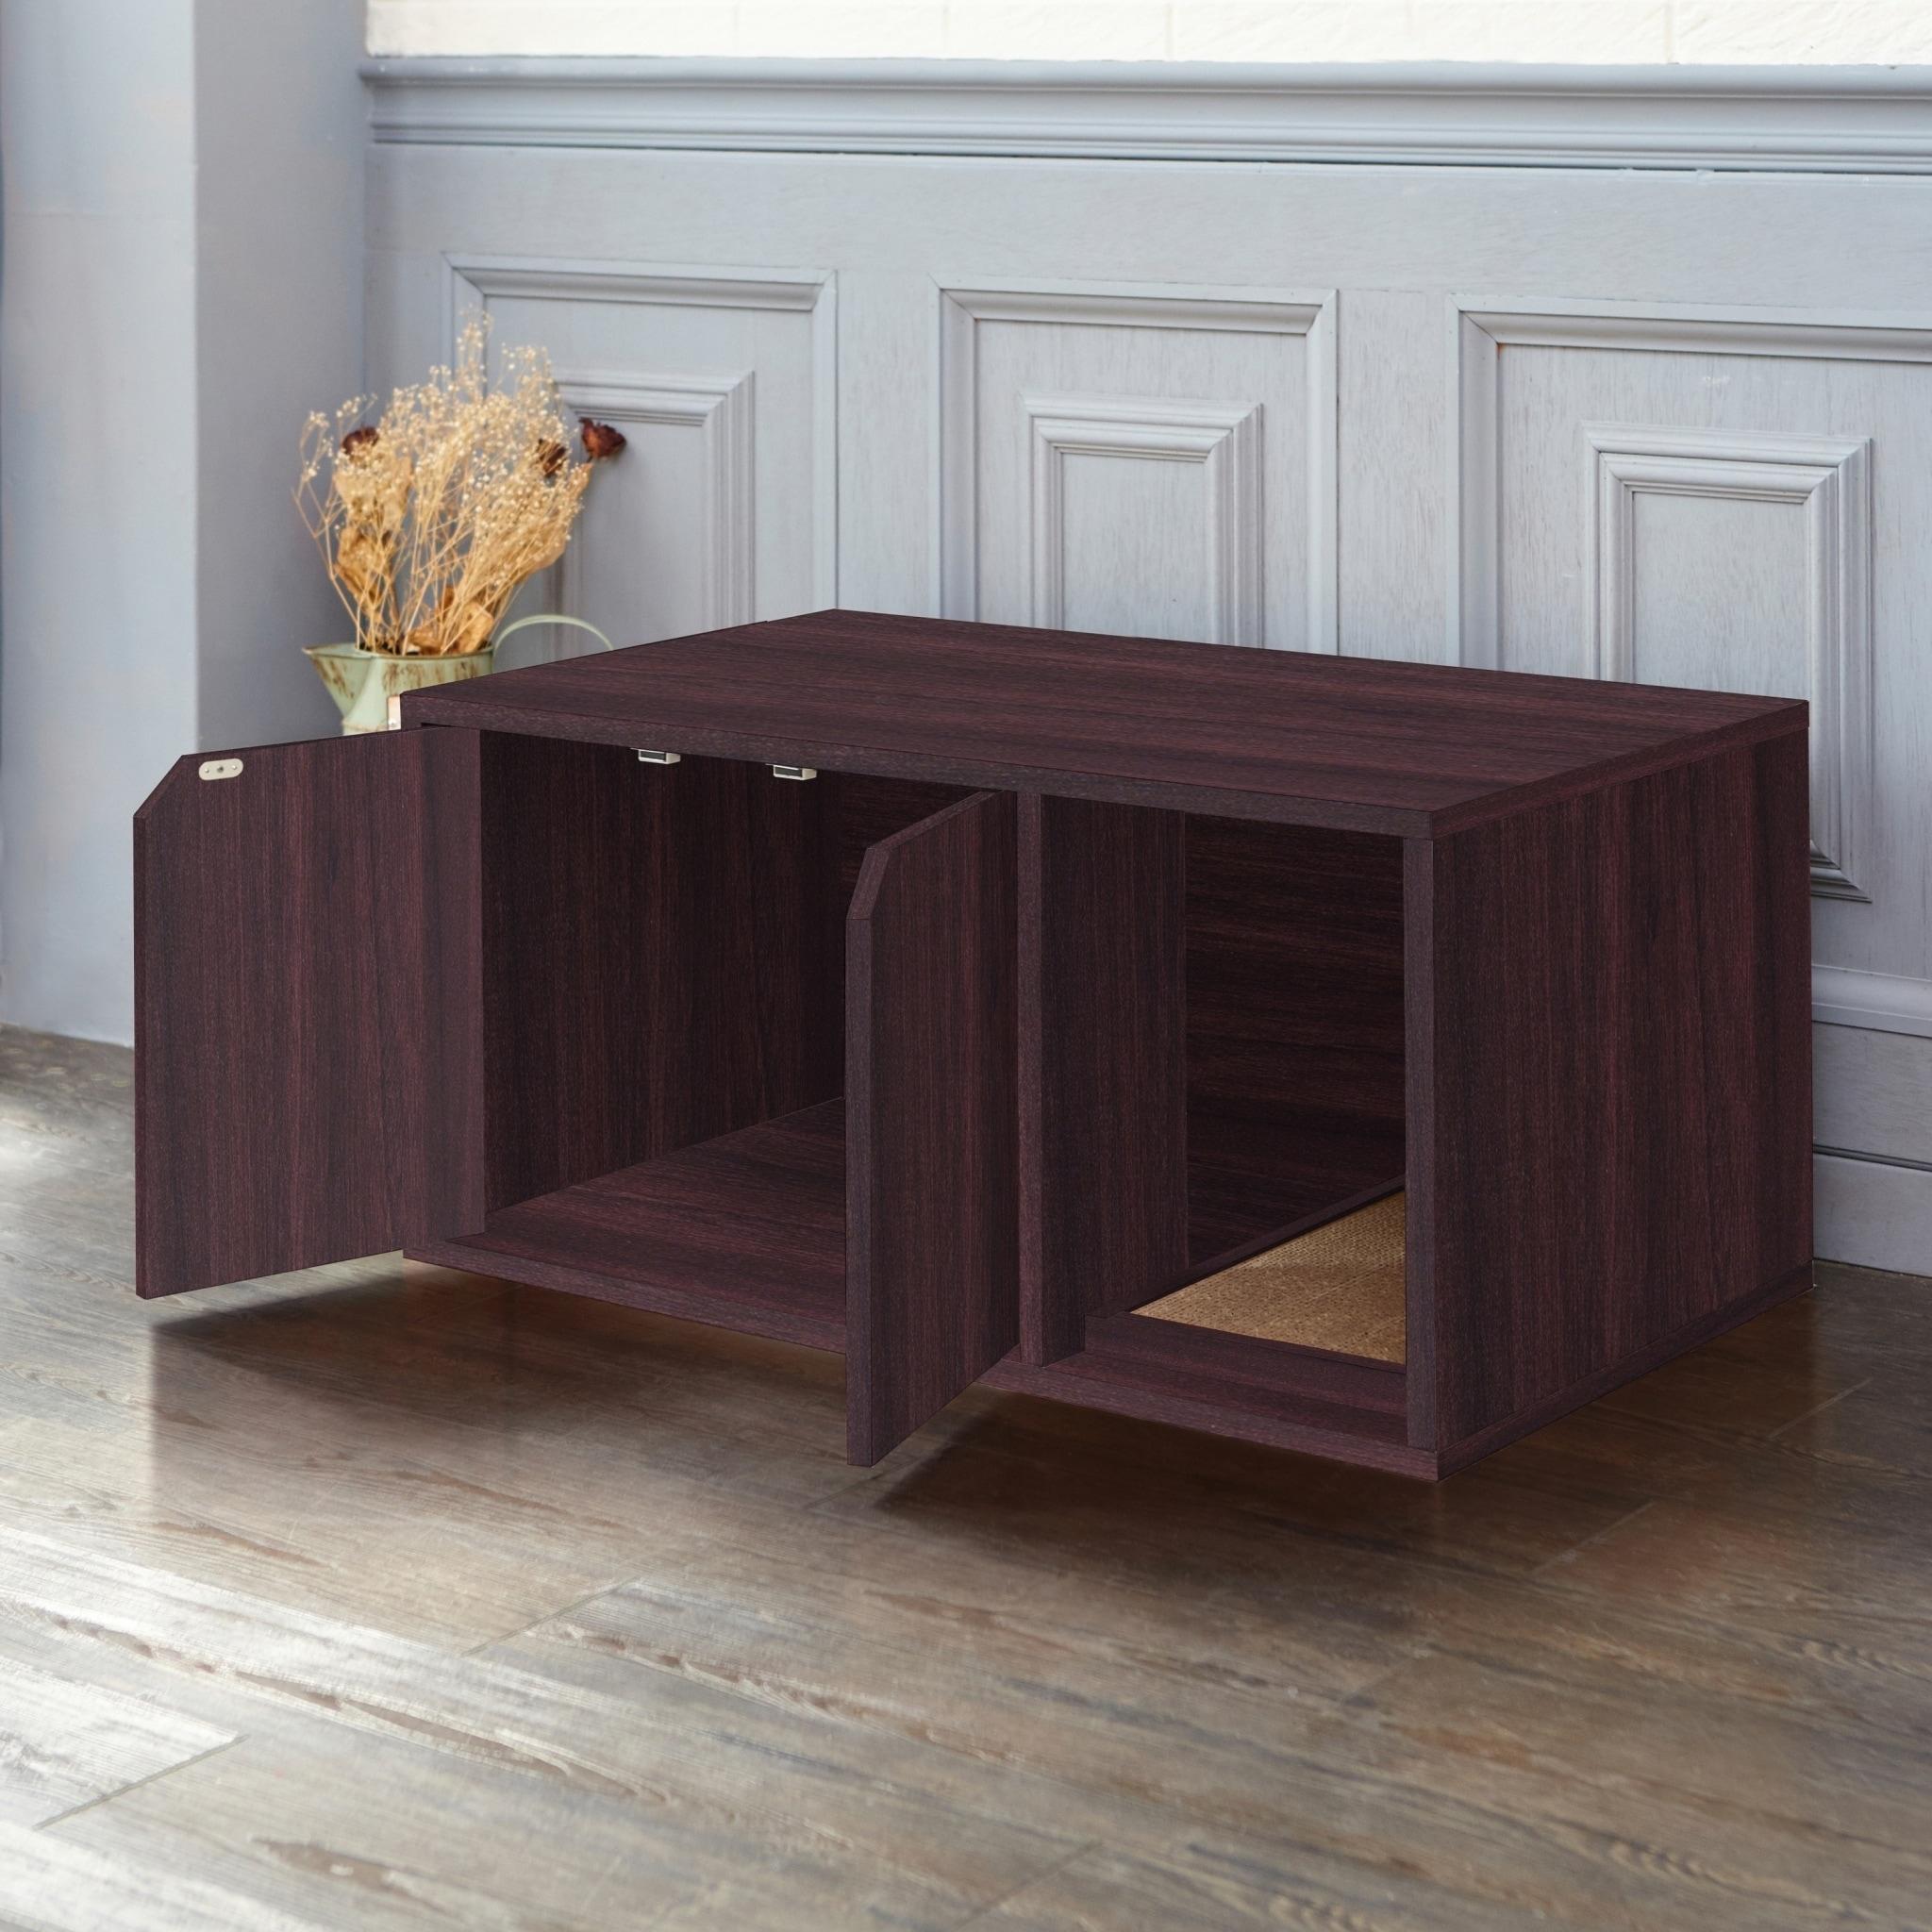 Eco Modern Cat Litter Box Furniture Espresso Lifetime Guarantee